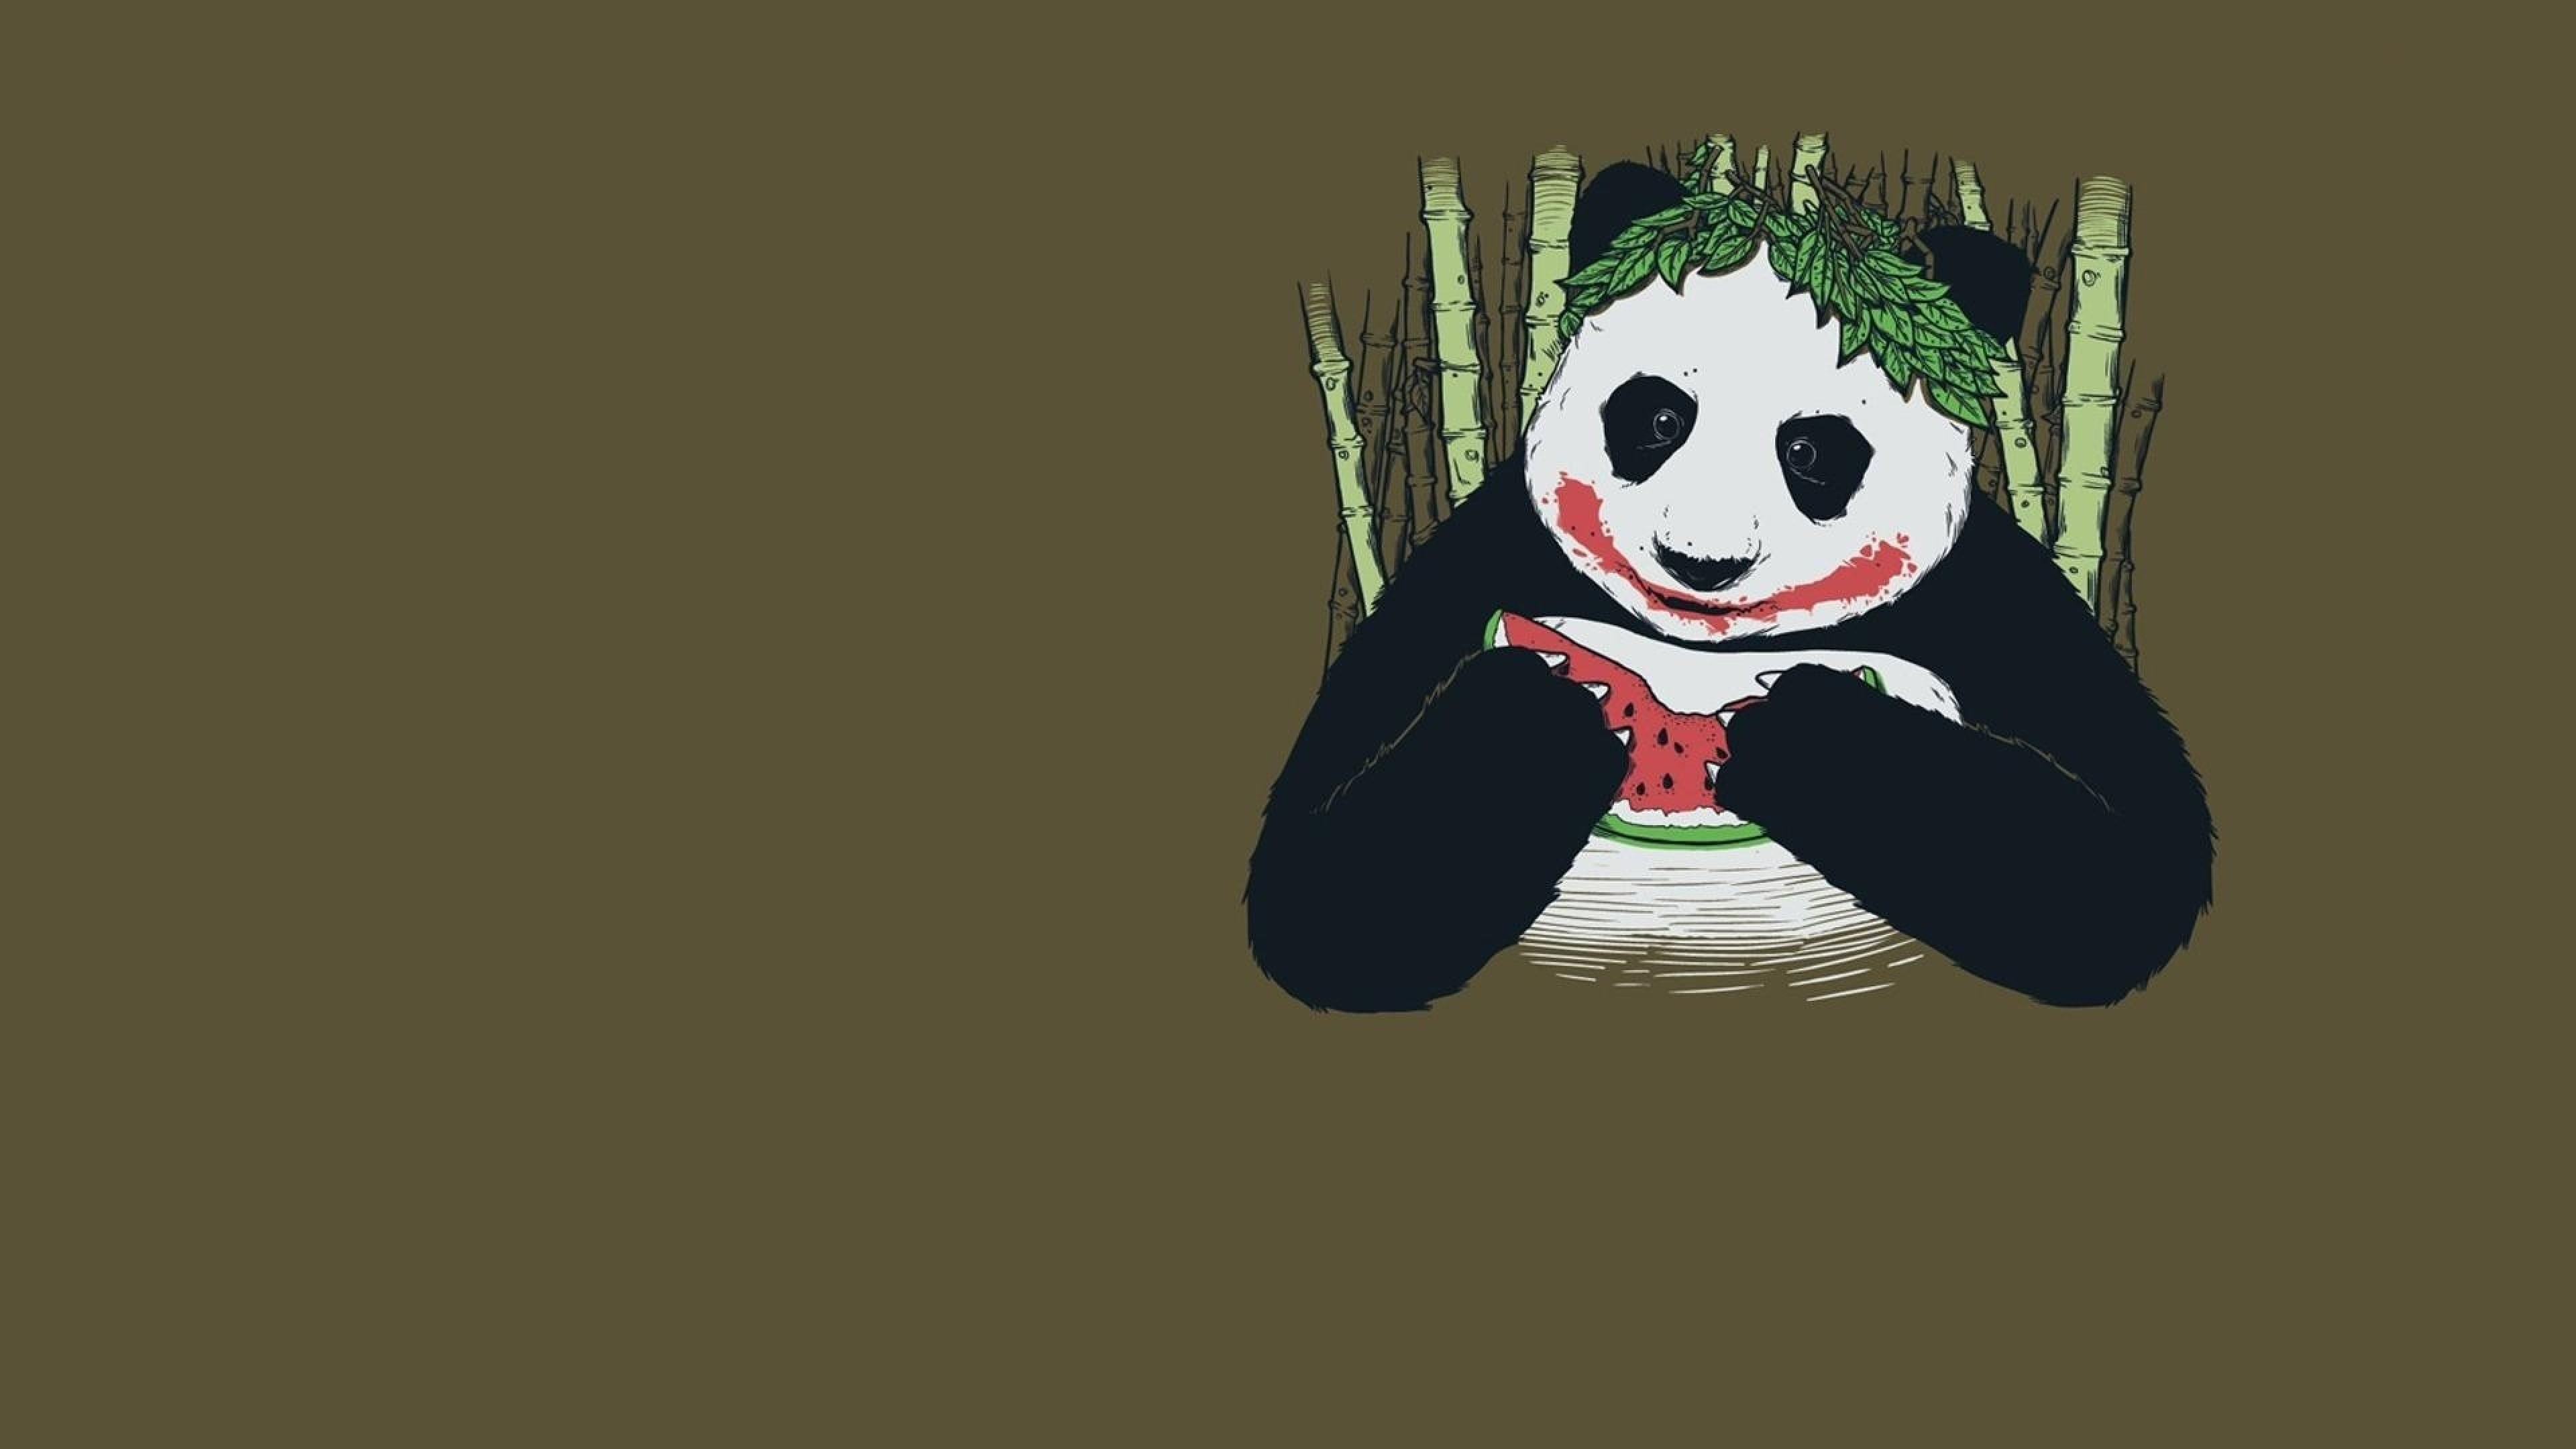 Preview wallpaper panda, joker, disguise 3840×2160